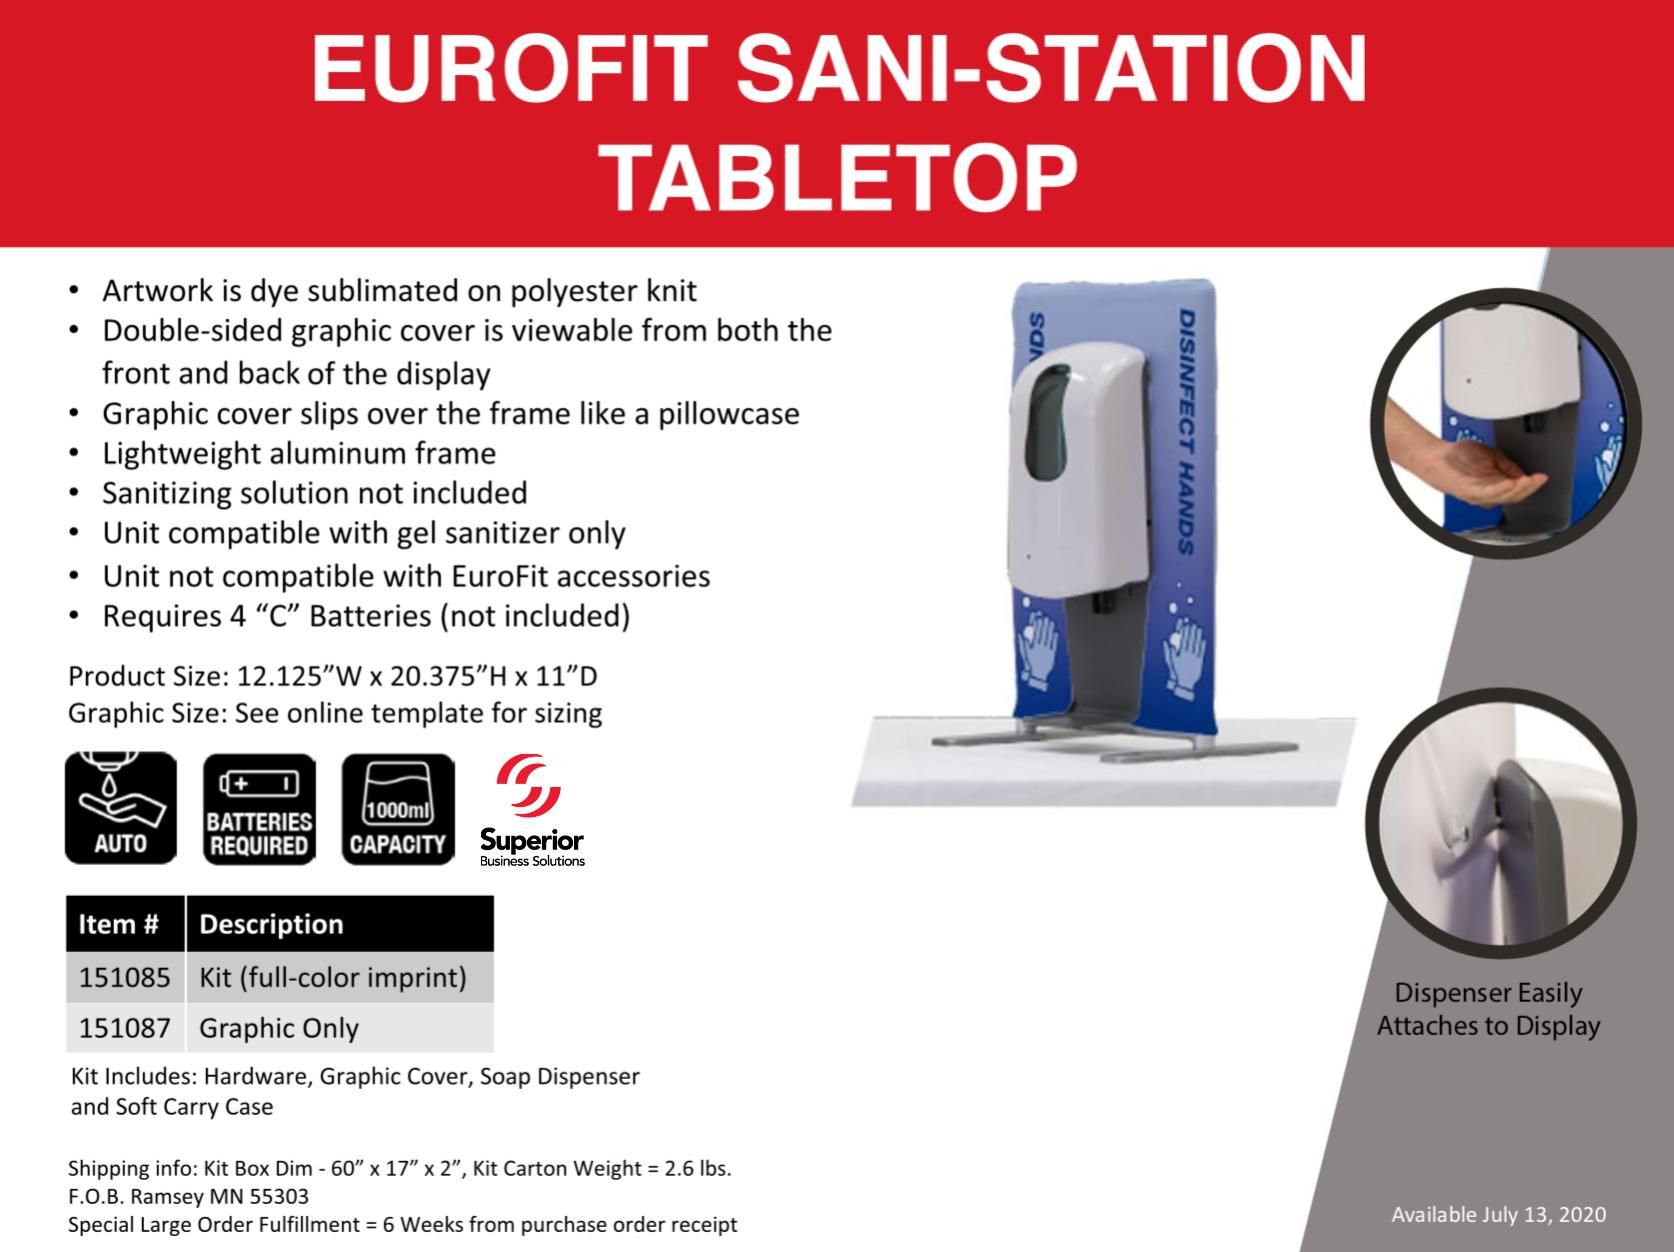 eurofit-sani-station-tabletop